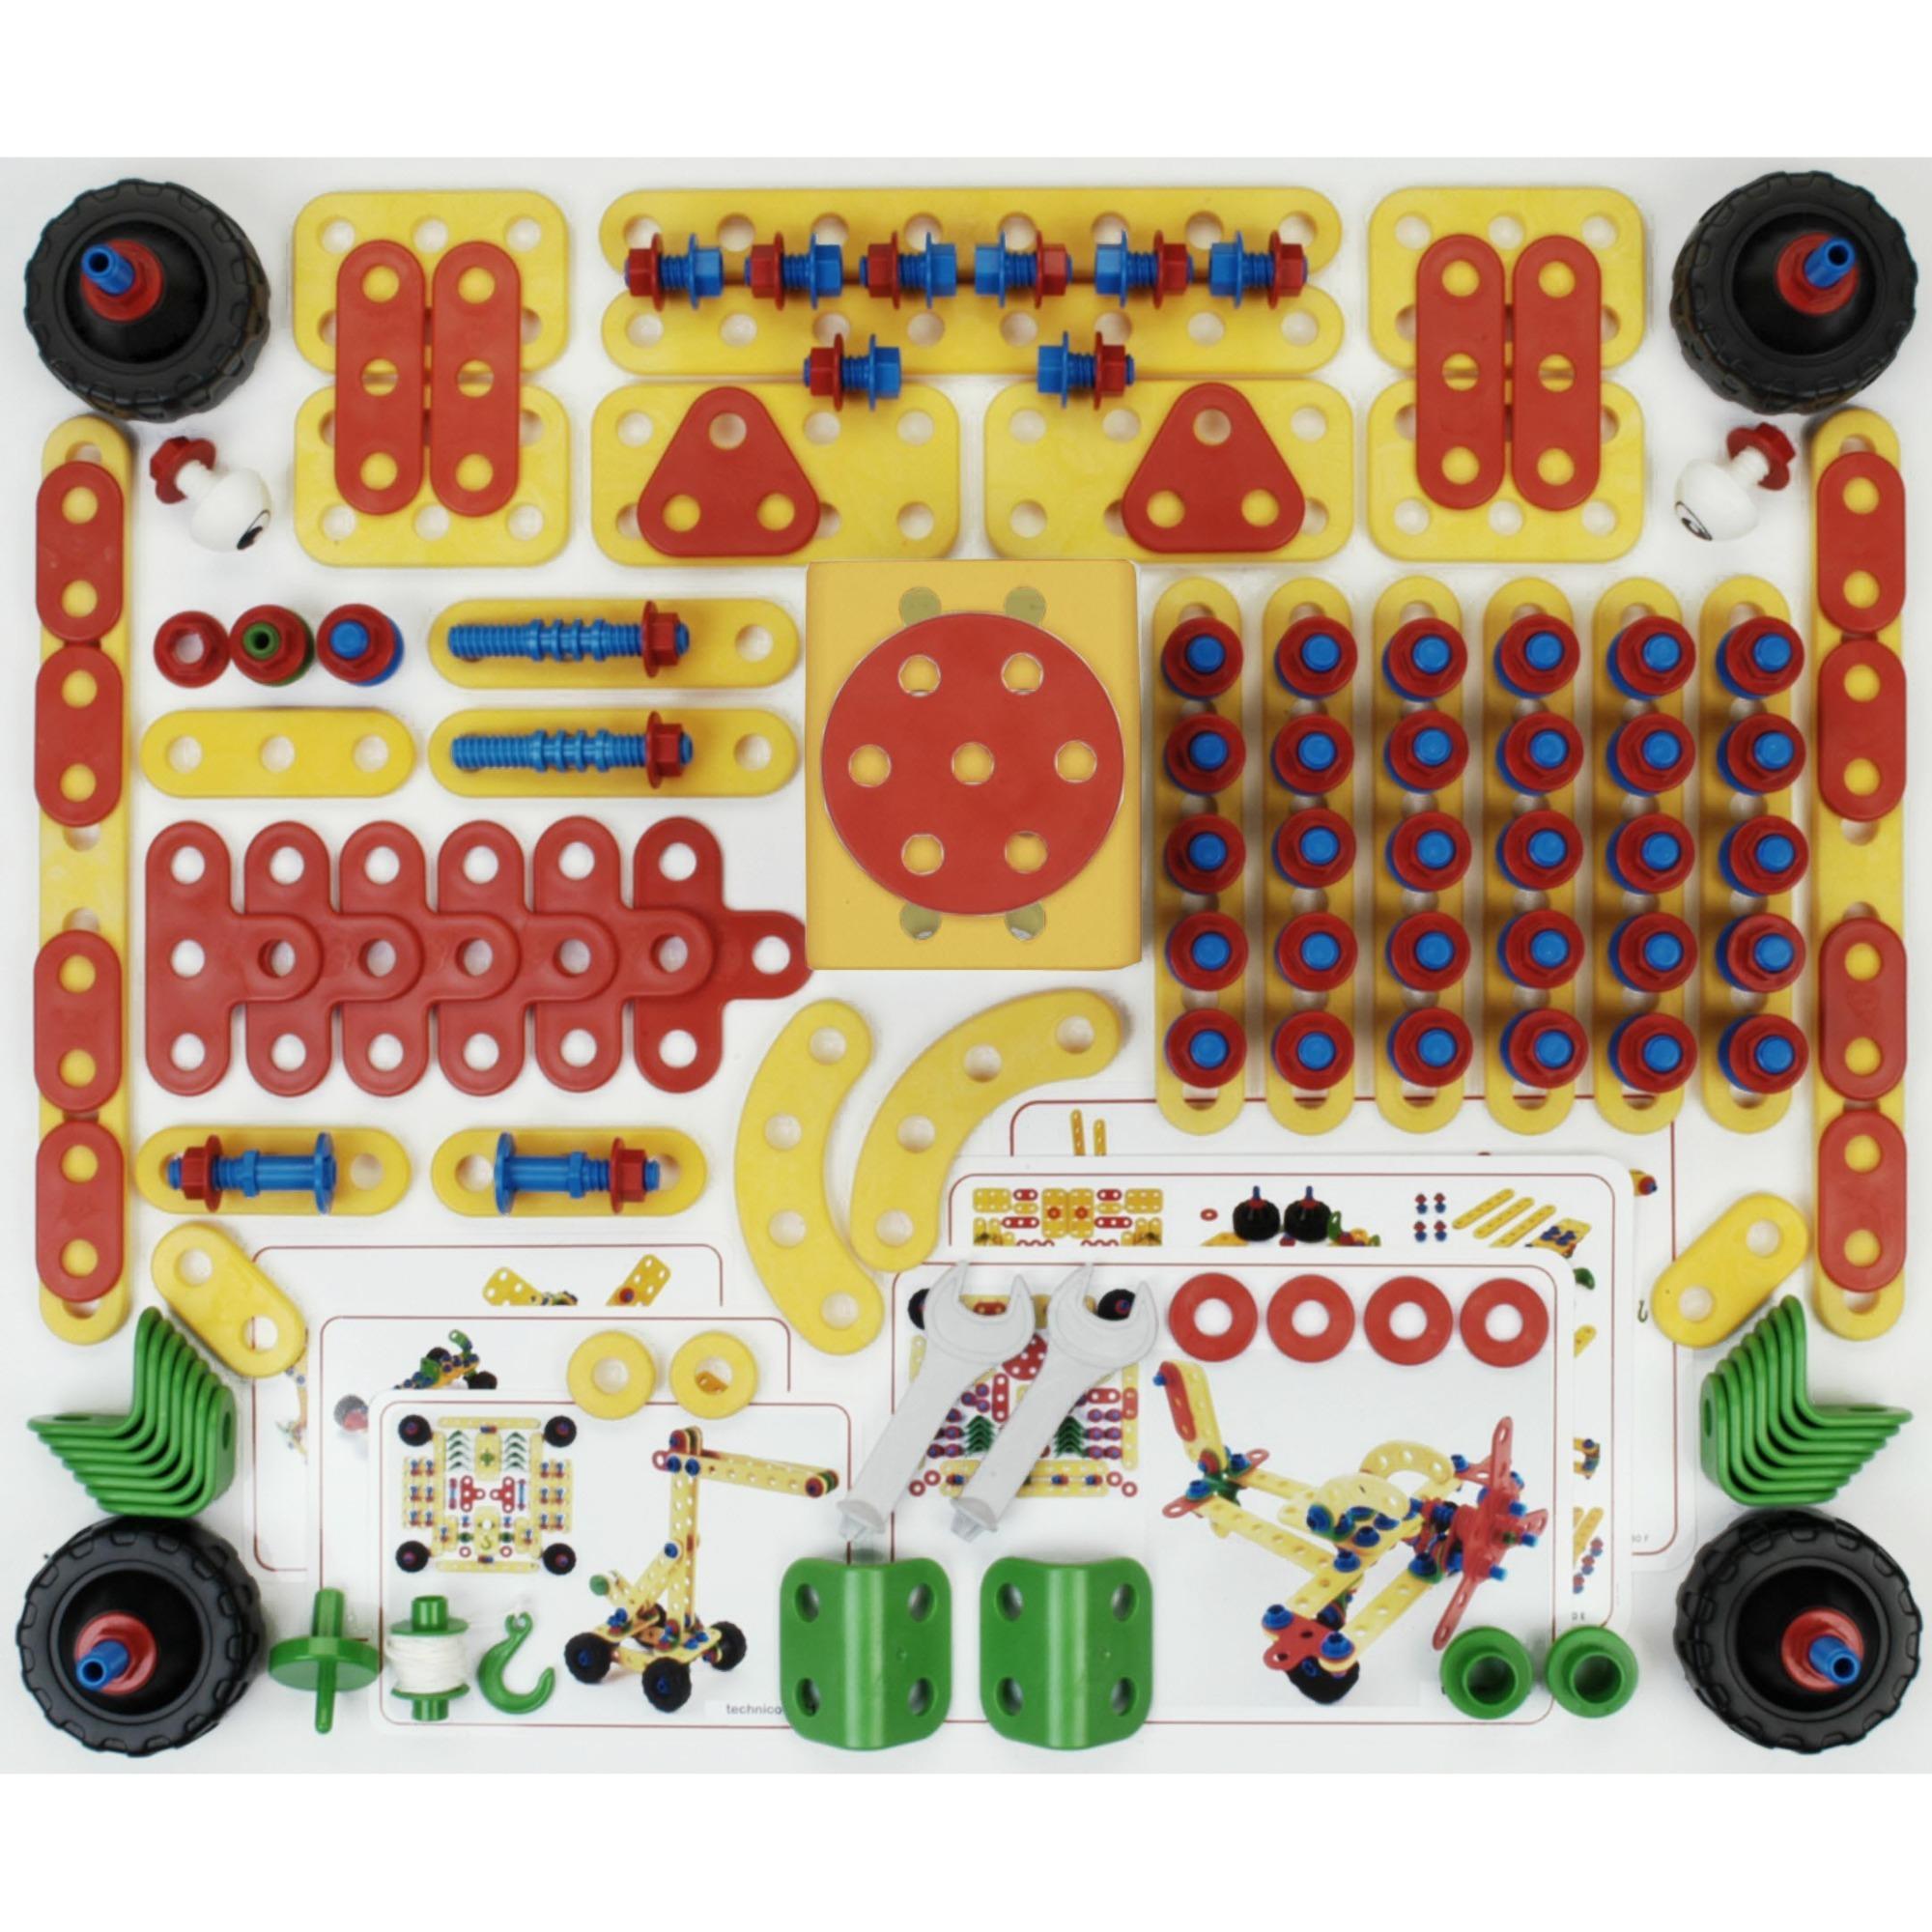 8741-vehicle-erector-set-187stykker-erectorsat-bygge-legetoj